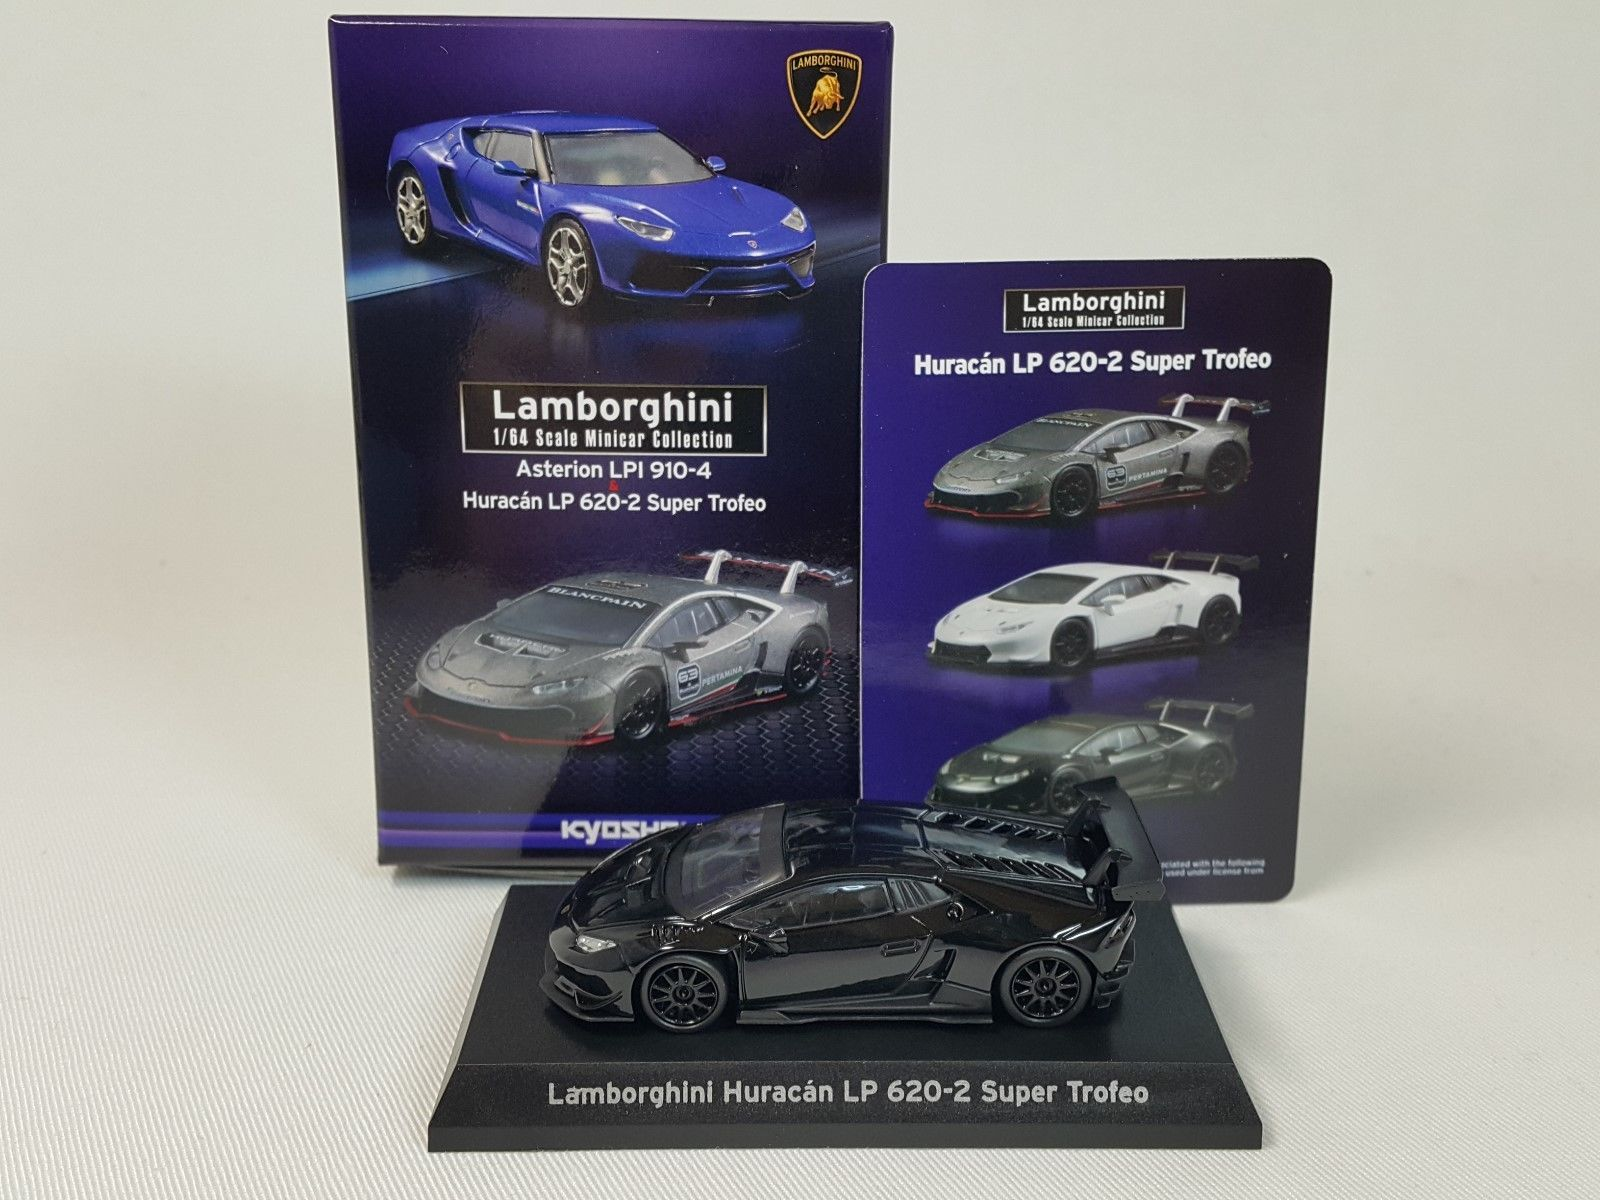 8f9c95a5308b95a5c318423140401a87 Gorgeous Lamborghini Huracan Lp620-2 Super Trofeo top Speed Cars Trend